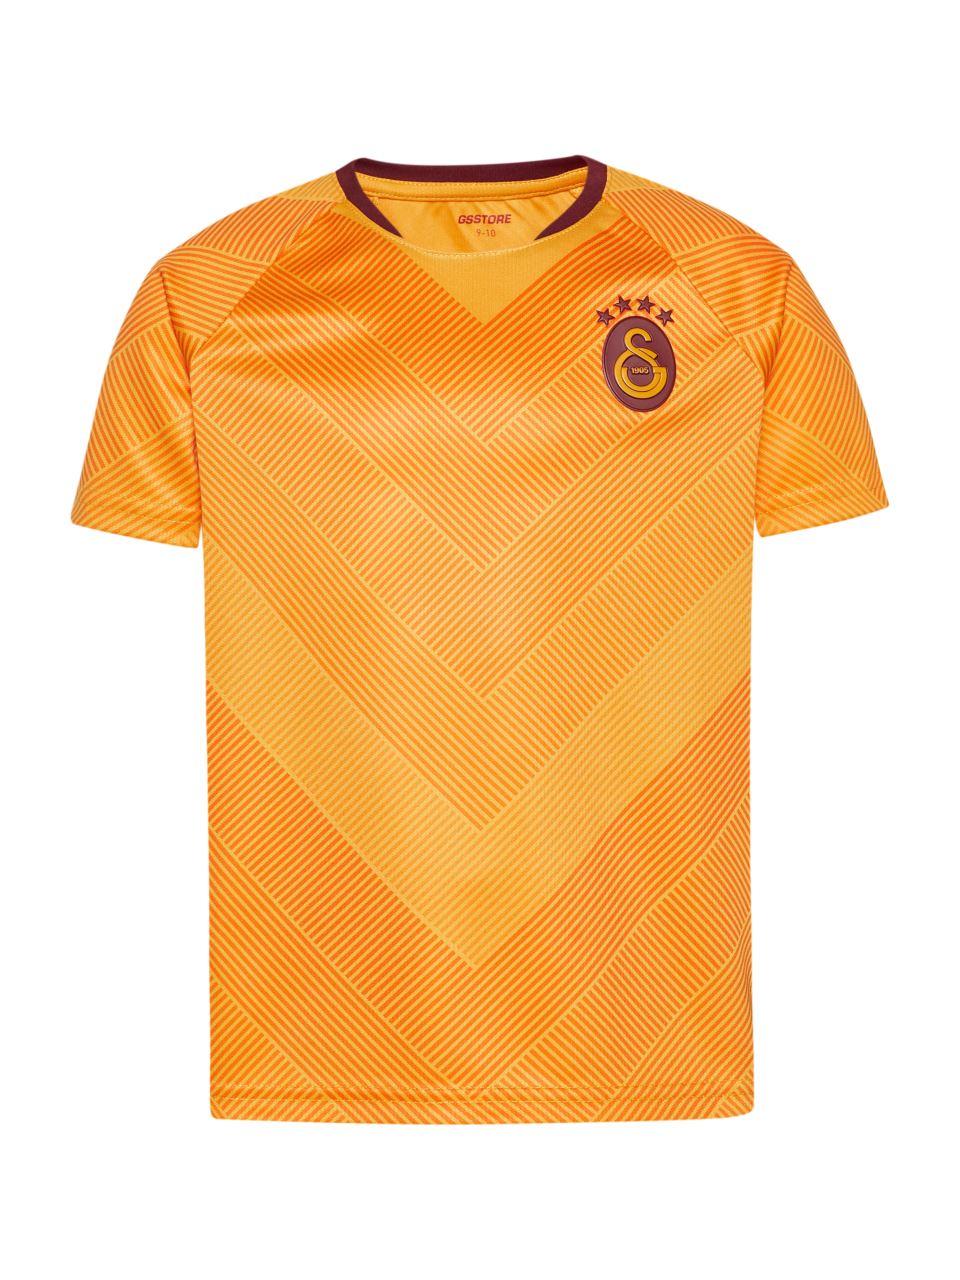 Galatasaray Tok Sarı Taraftar Çocuk T-shirt C191210